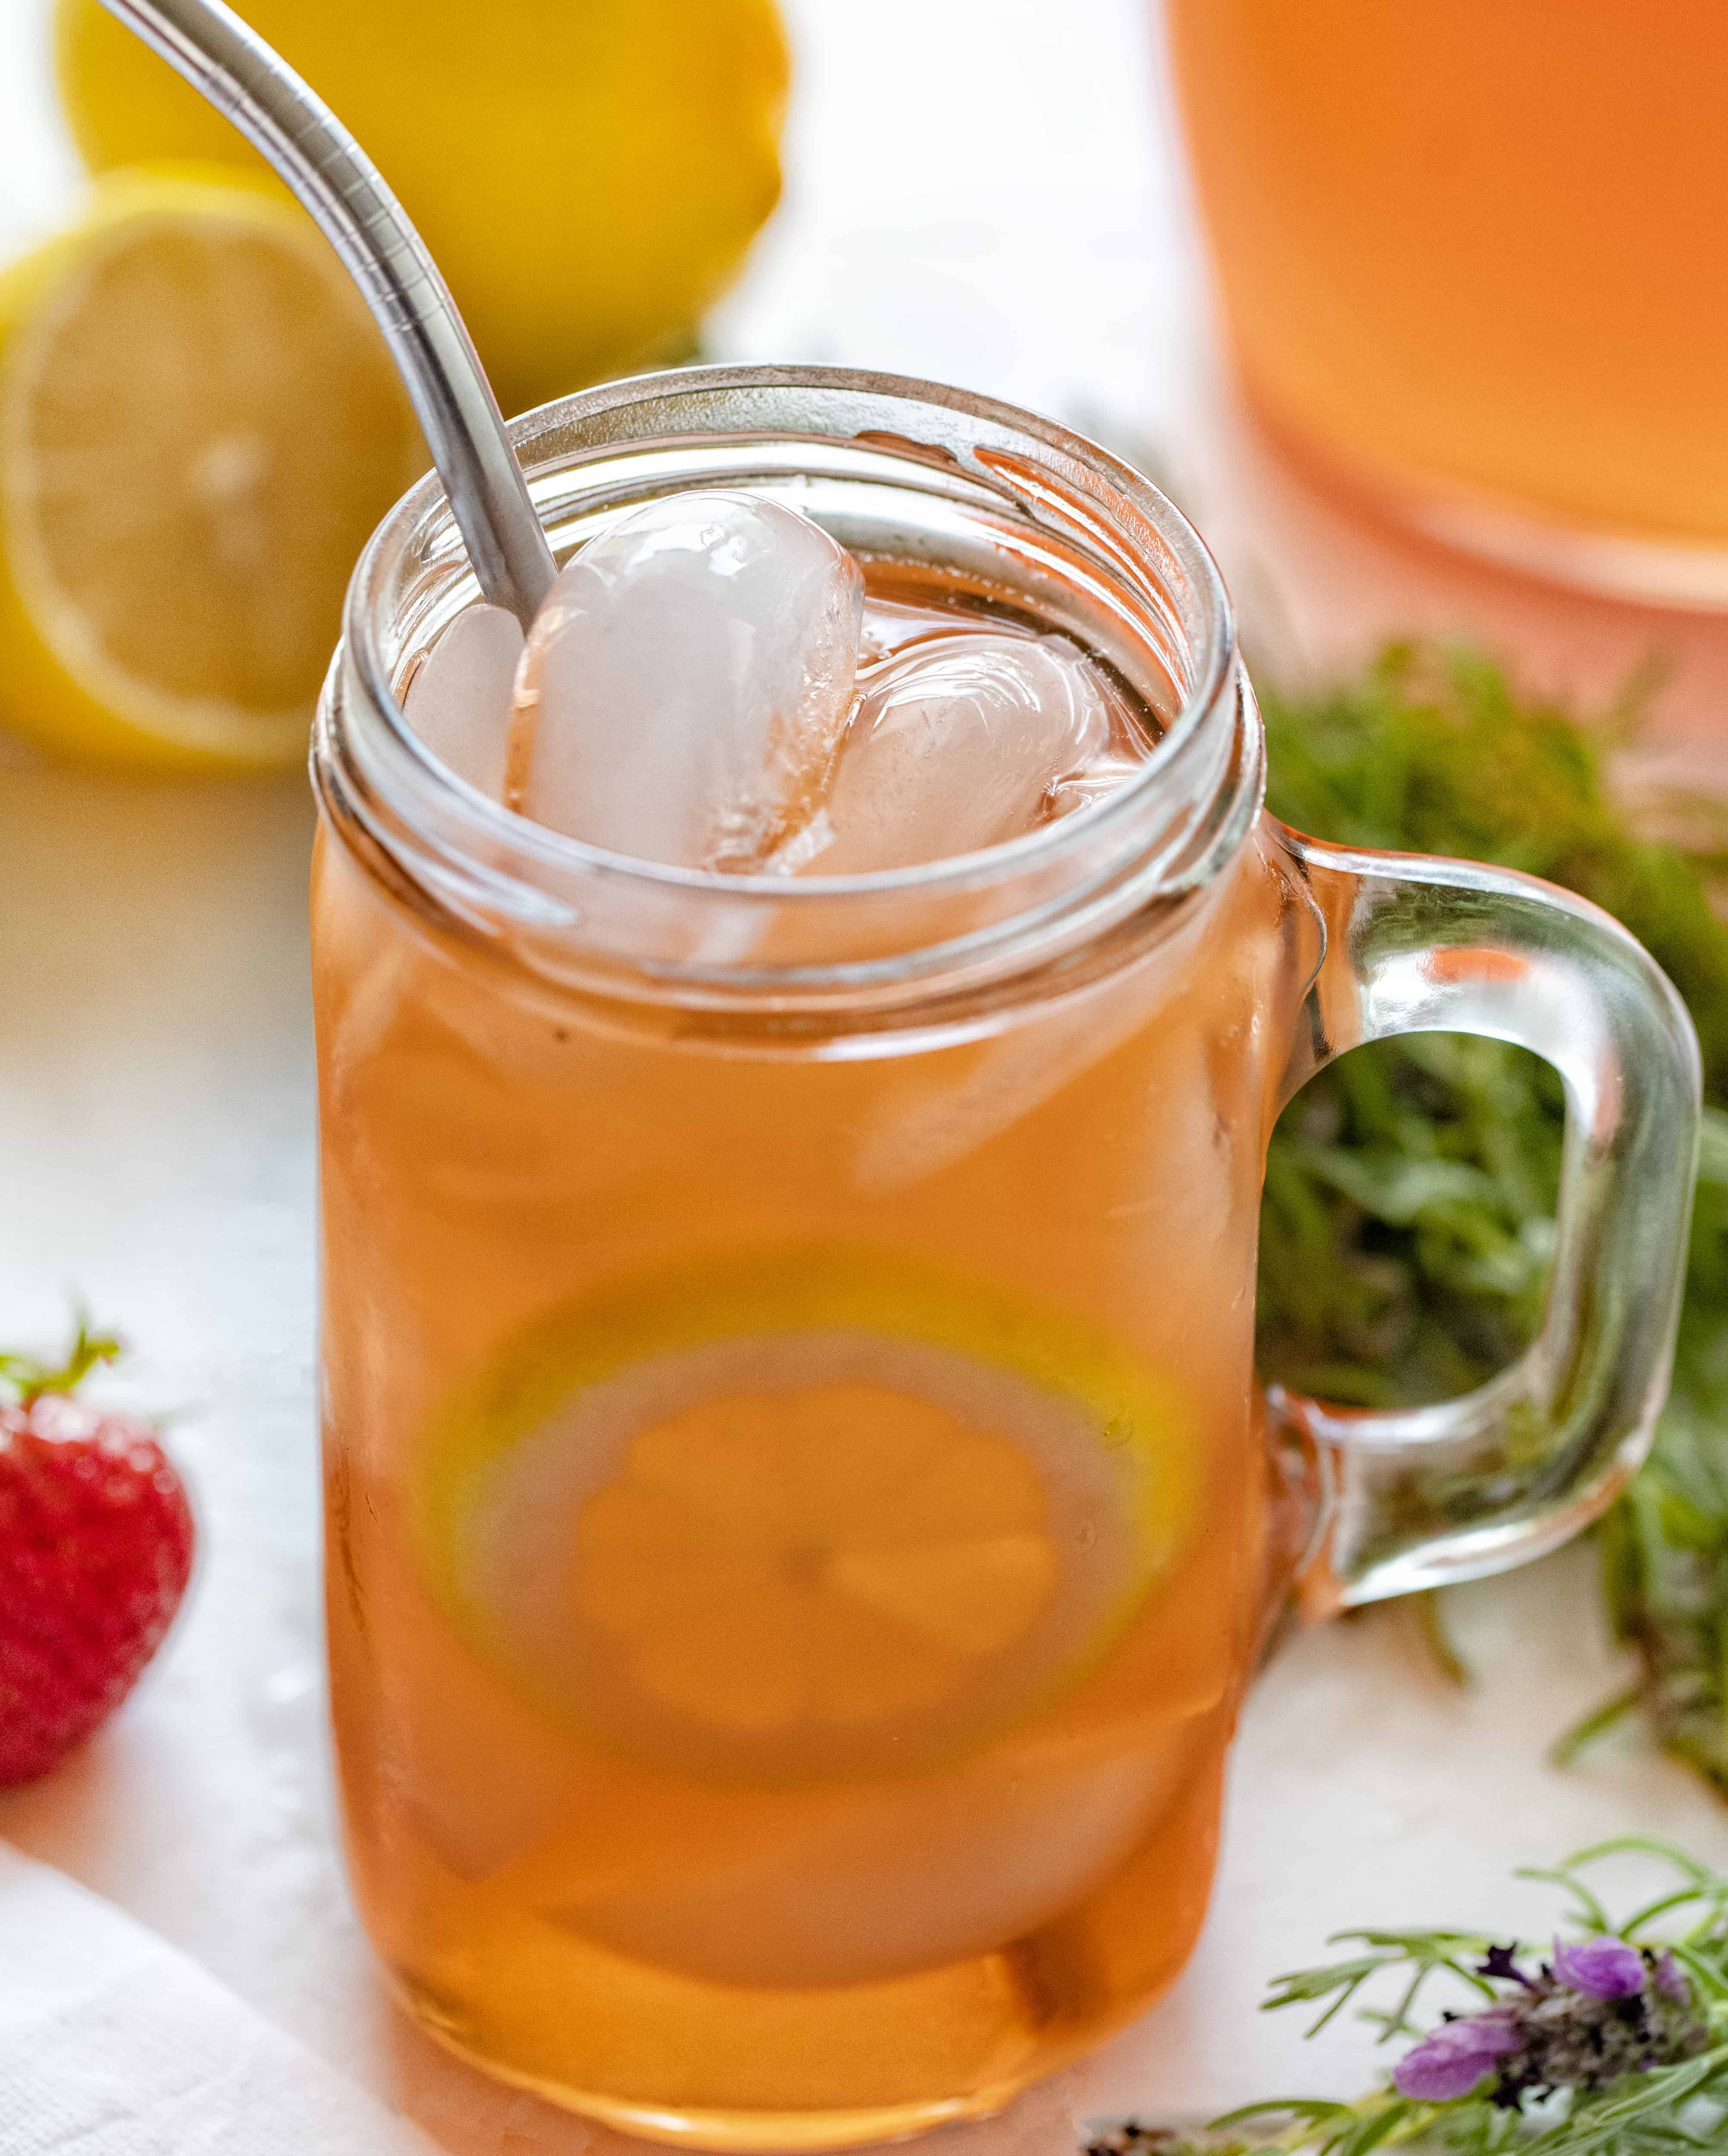 How to Make Strawberry Lavender Lemonade